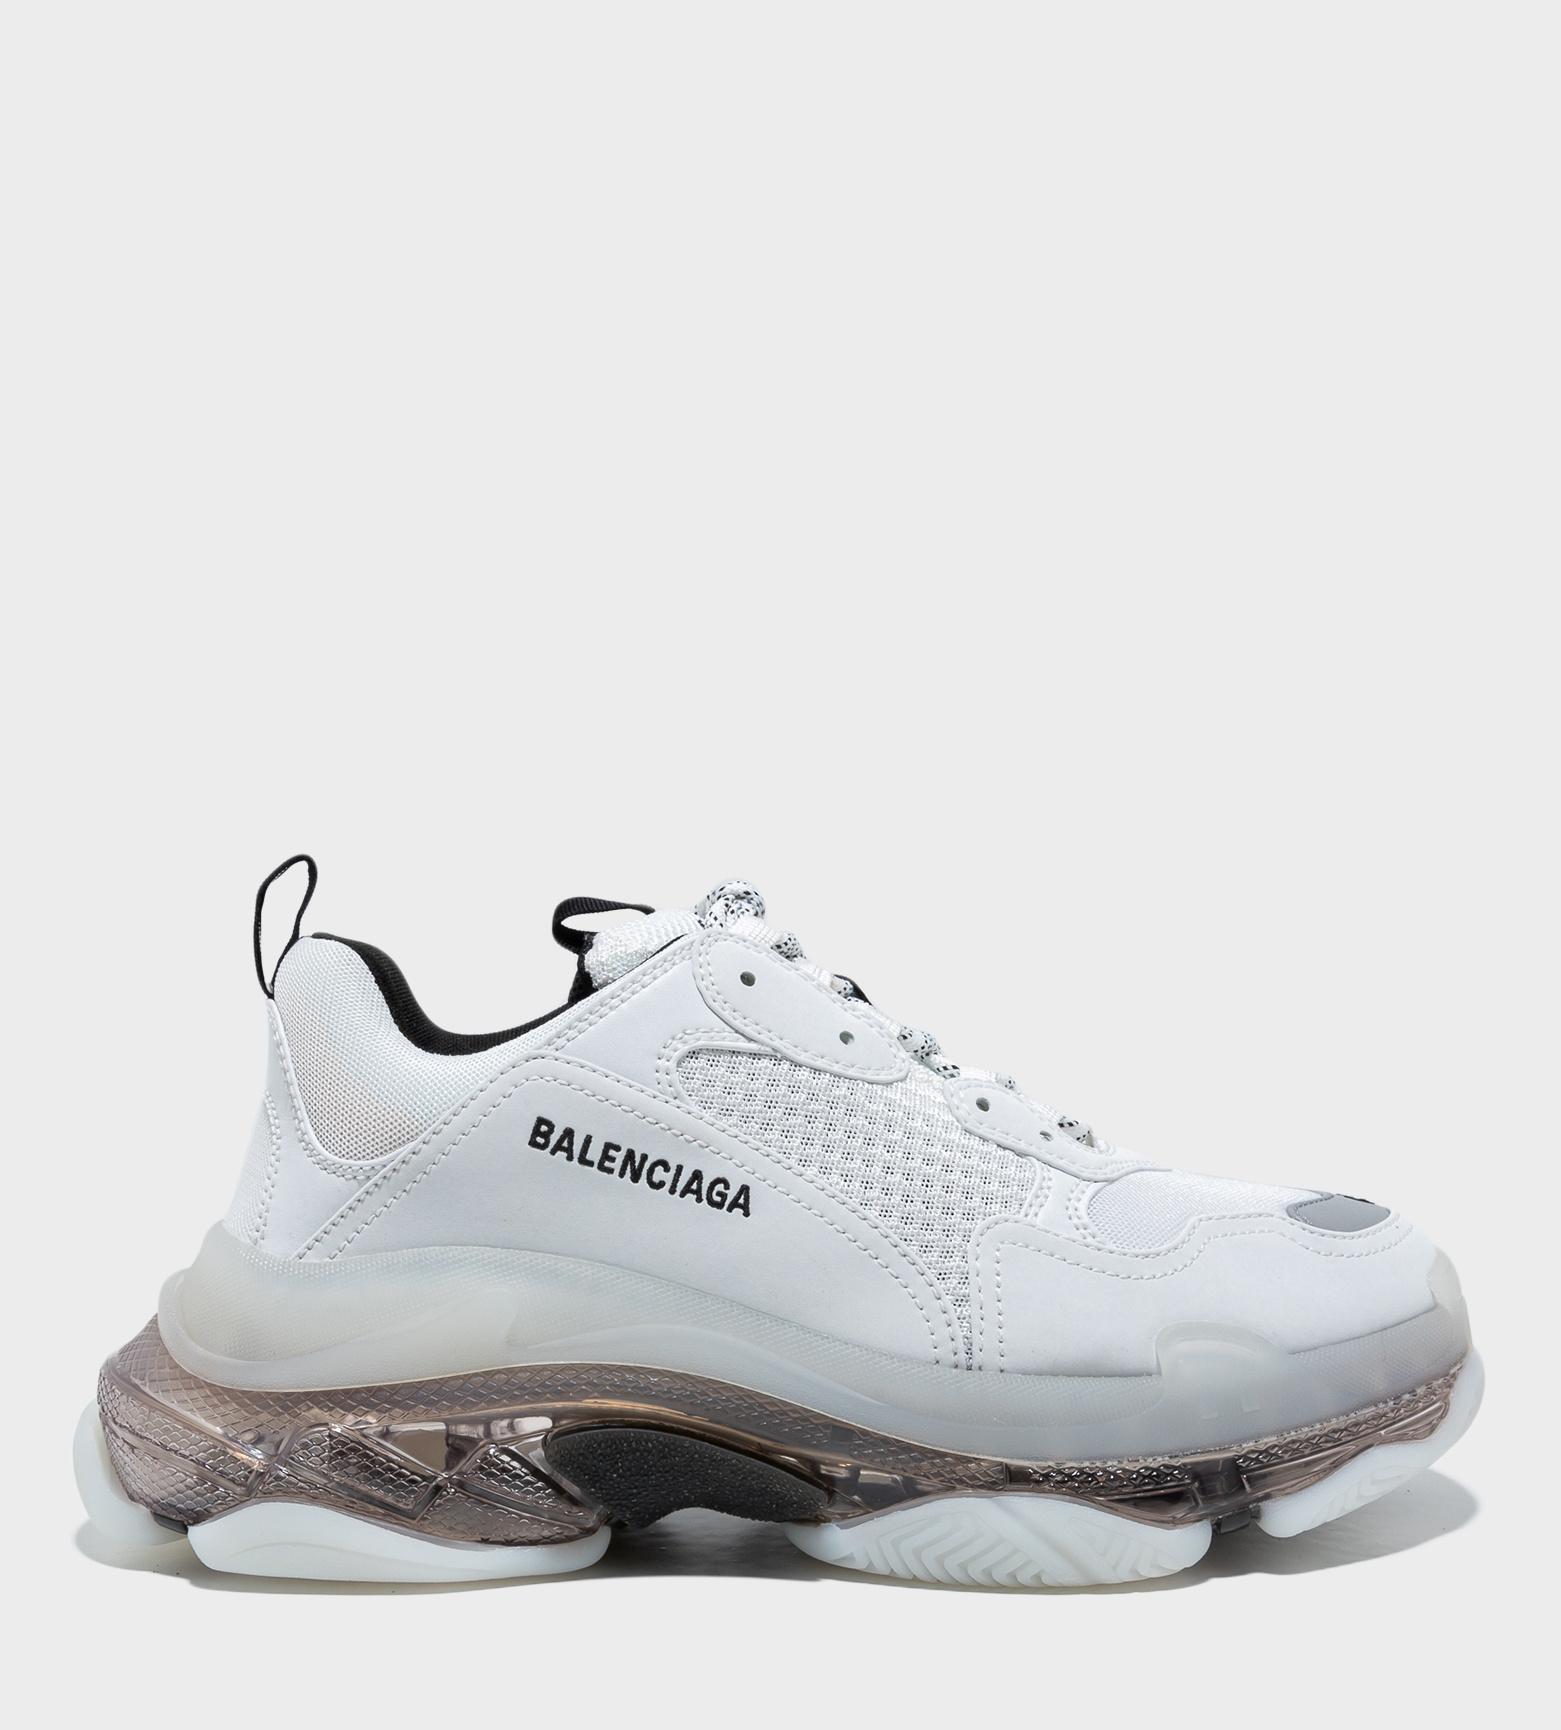 BALENCIAGA Triple S Clear Sole Sneakers White